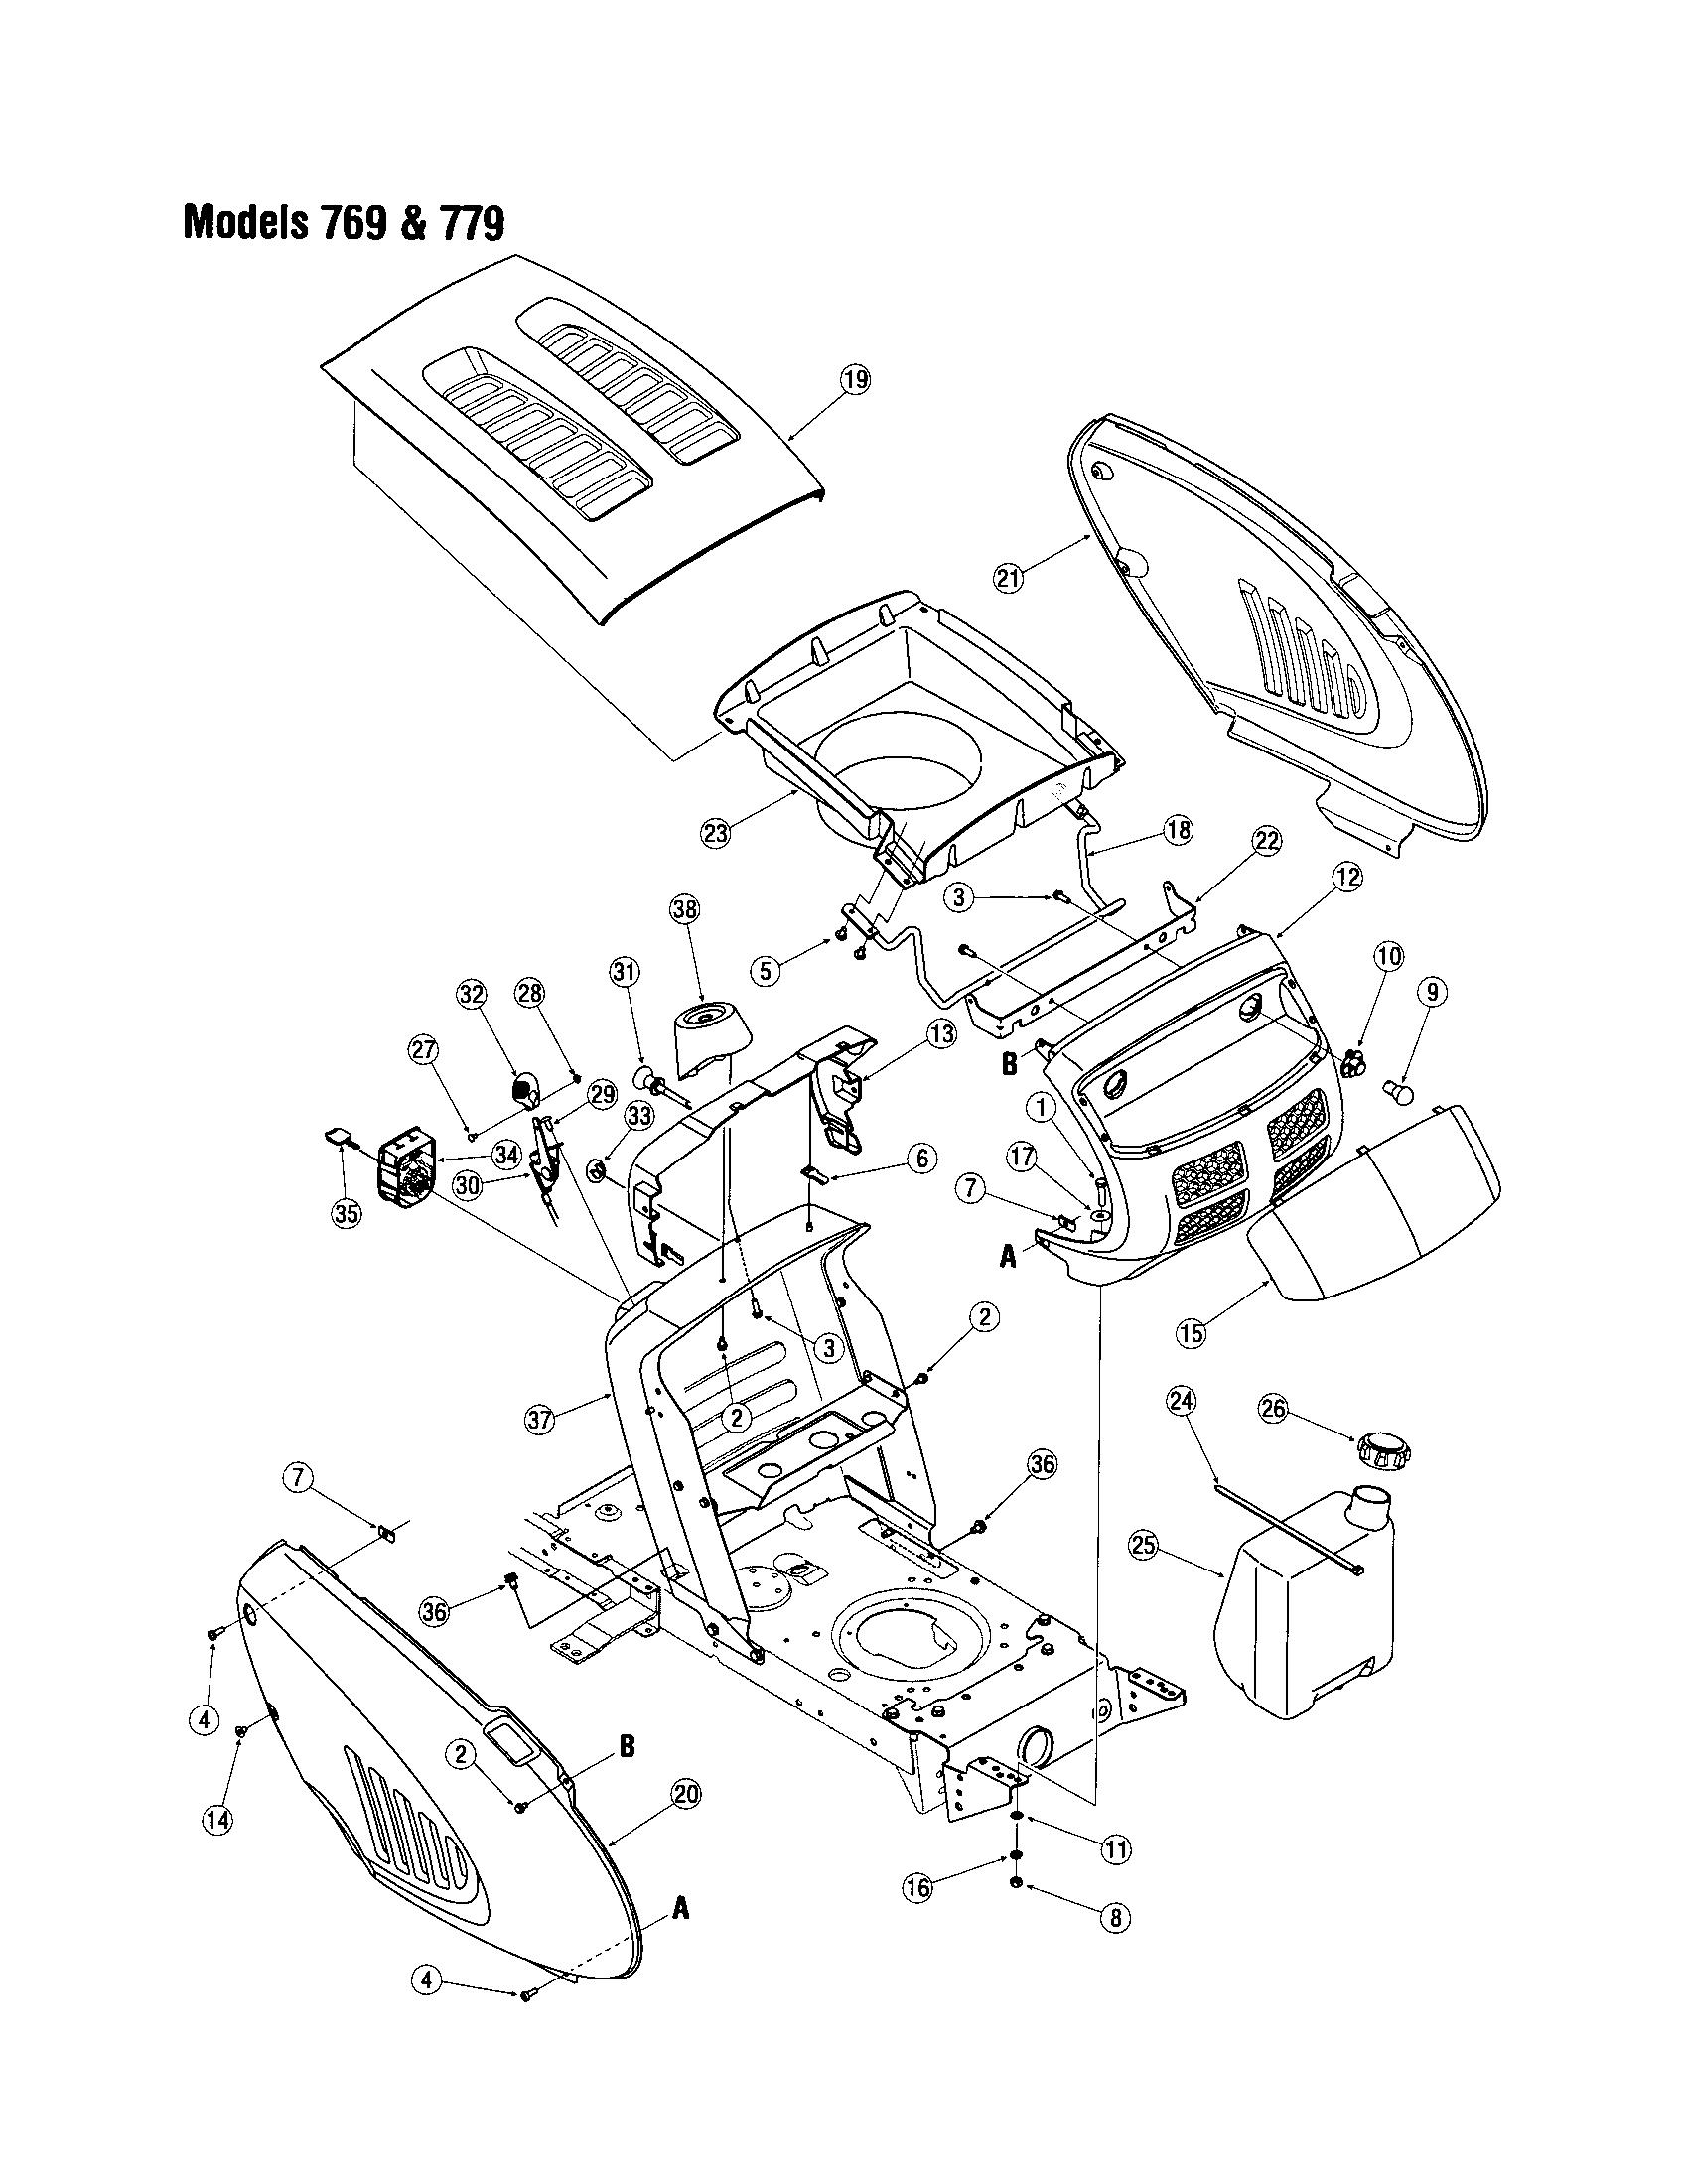 Mtd model 771 lawn, tractor genuine parts